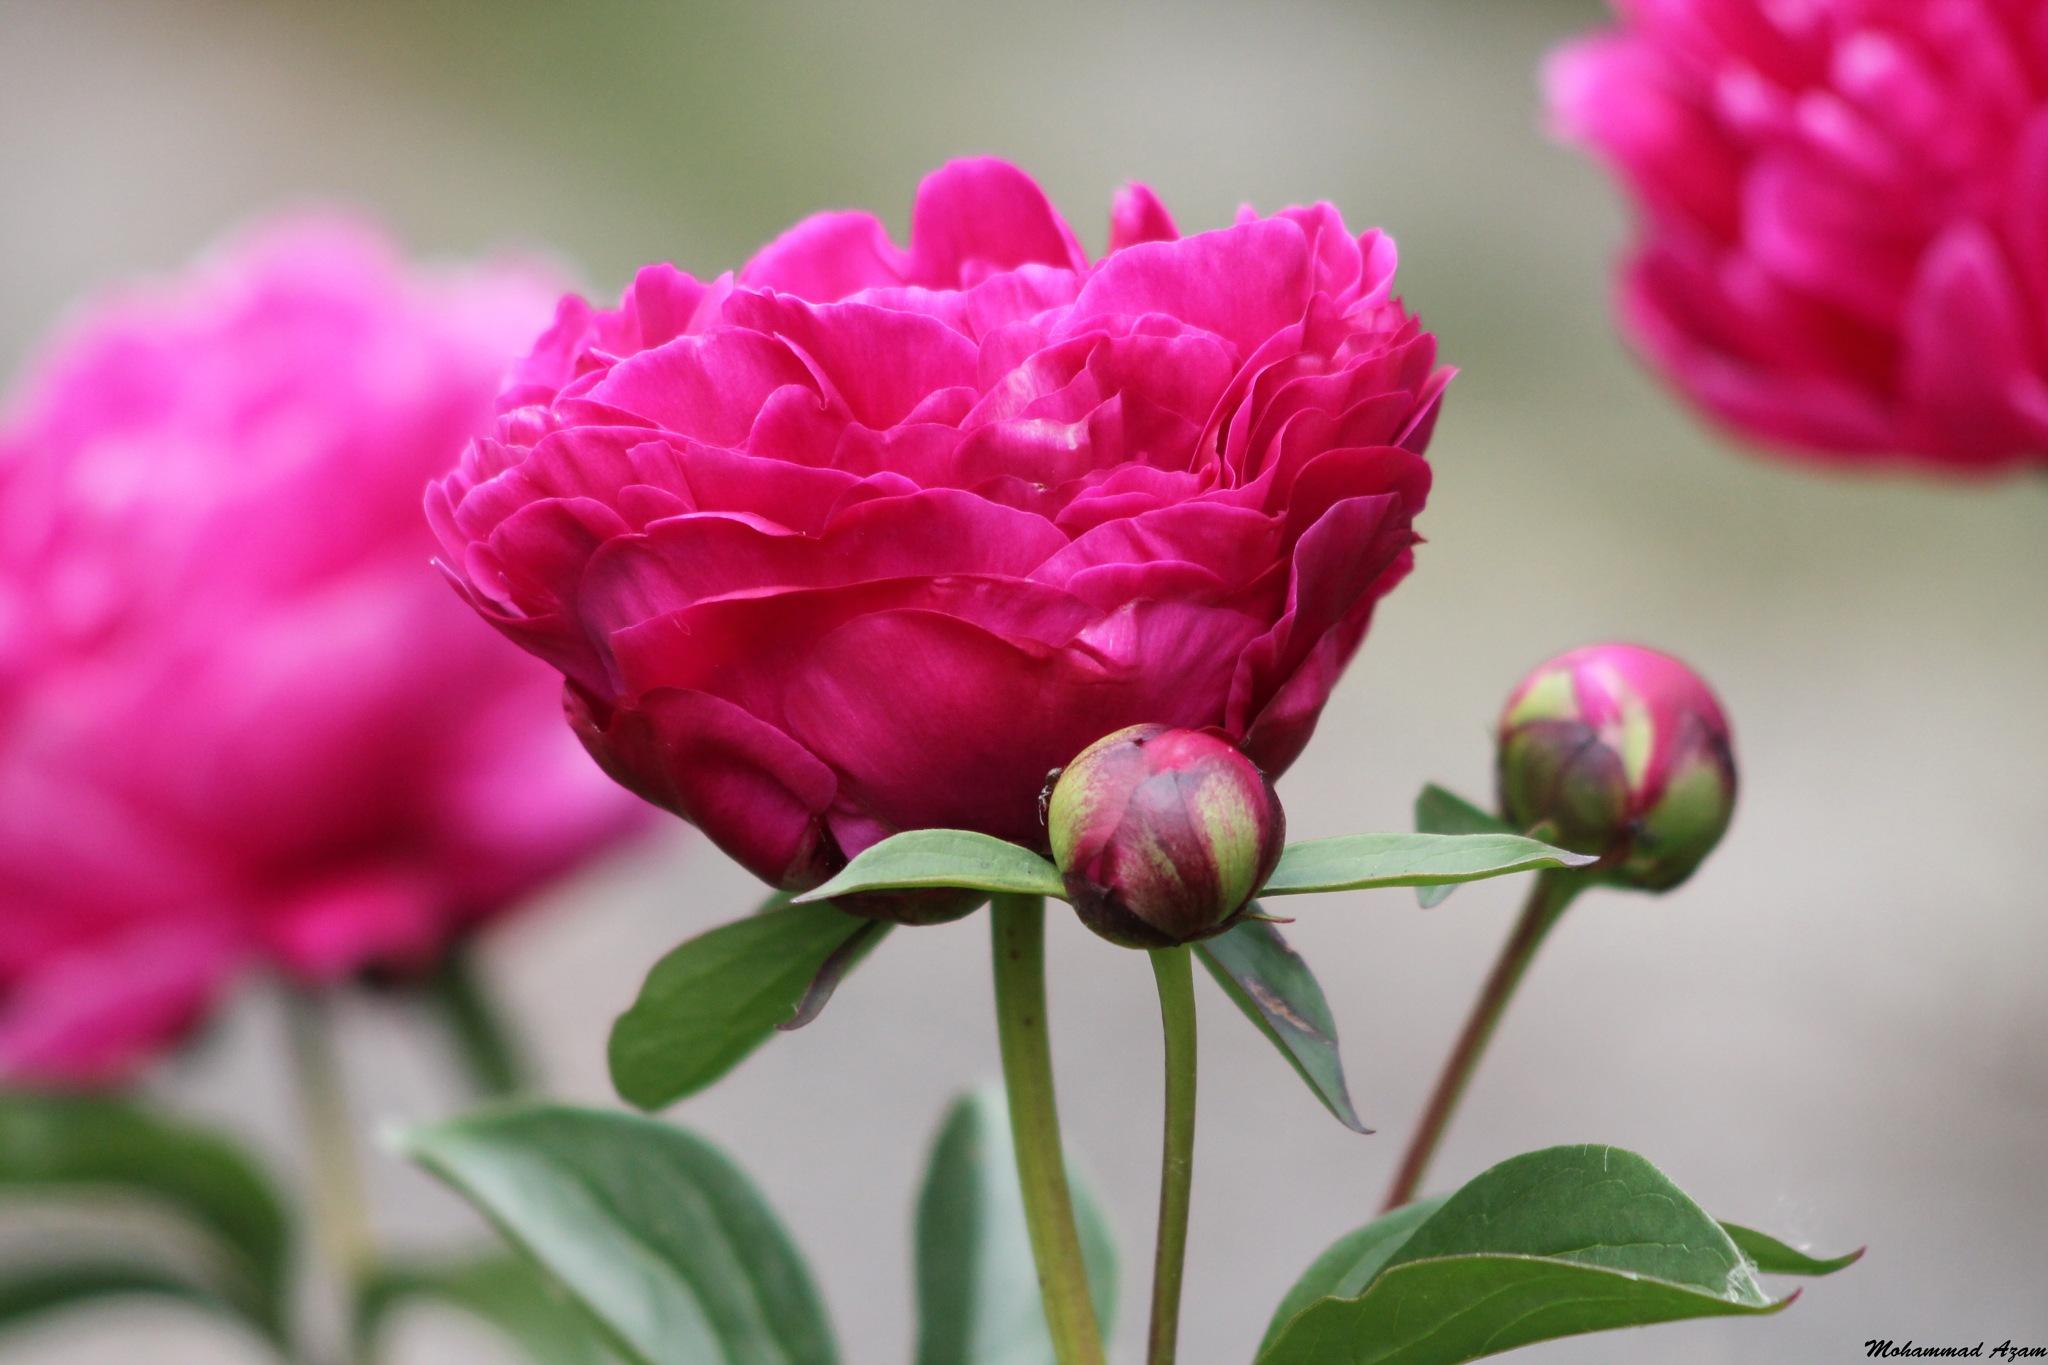 Flower 257 by Mohammad Azam